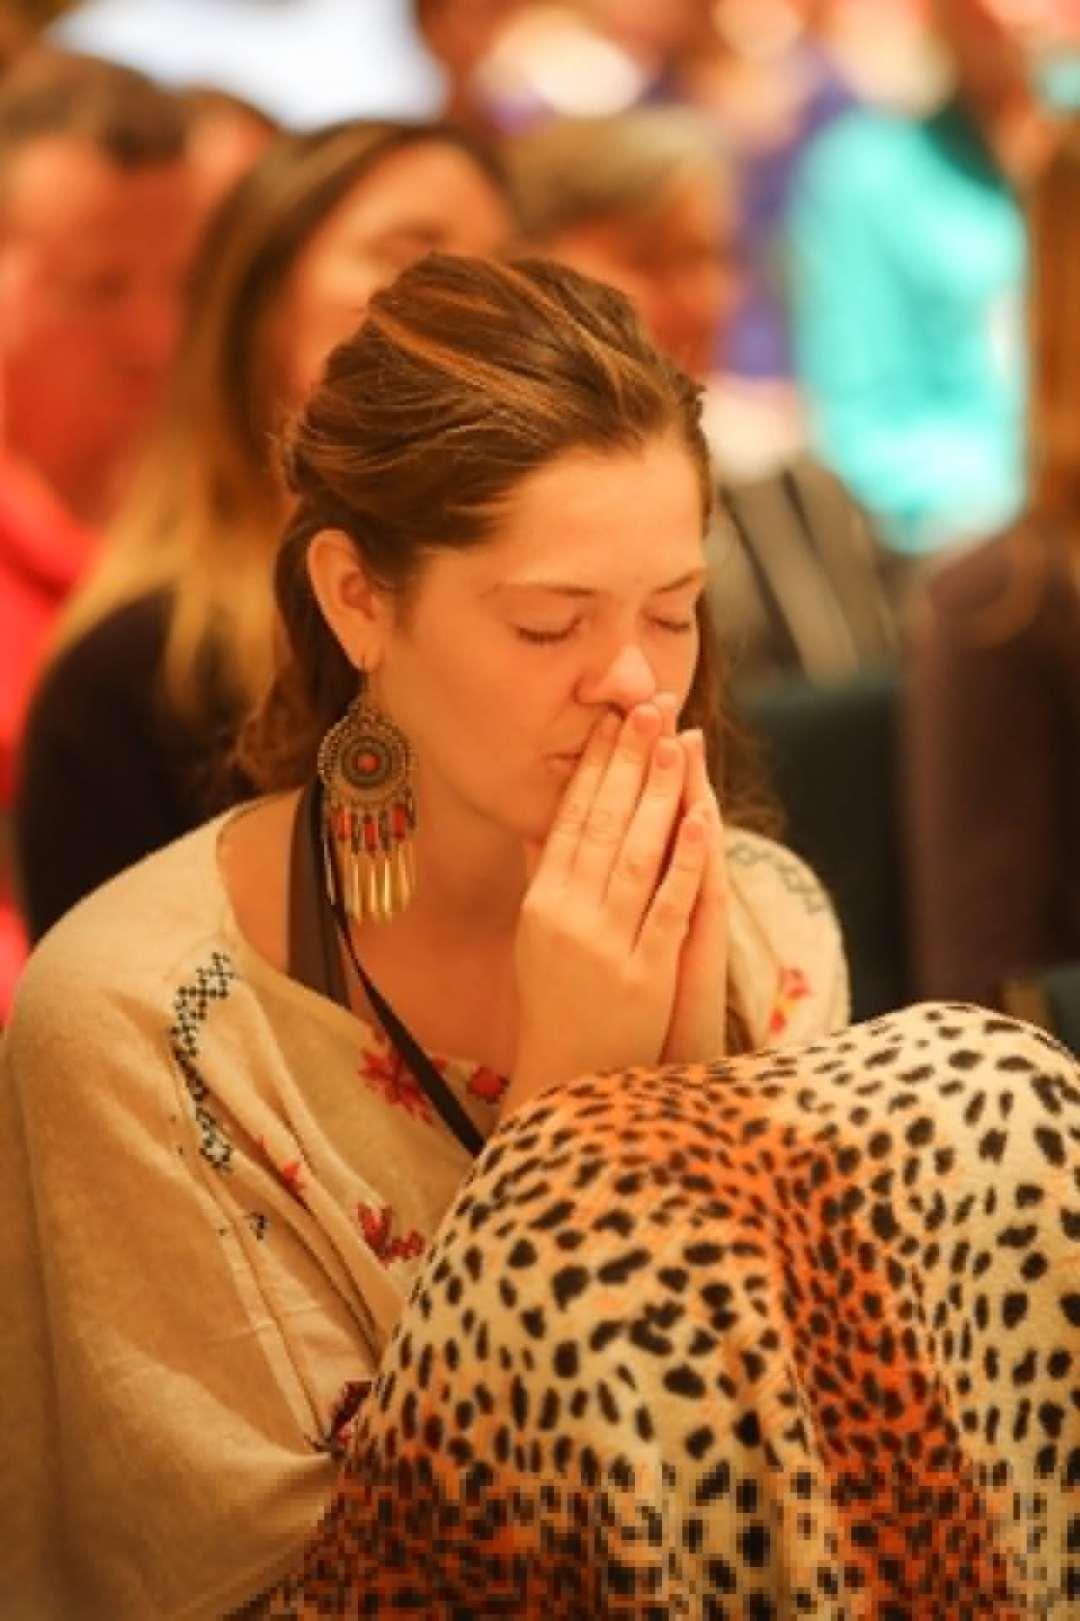 meditation  - Retraite méditative |Témoignage (Part 4)